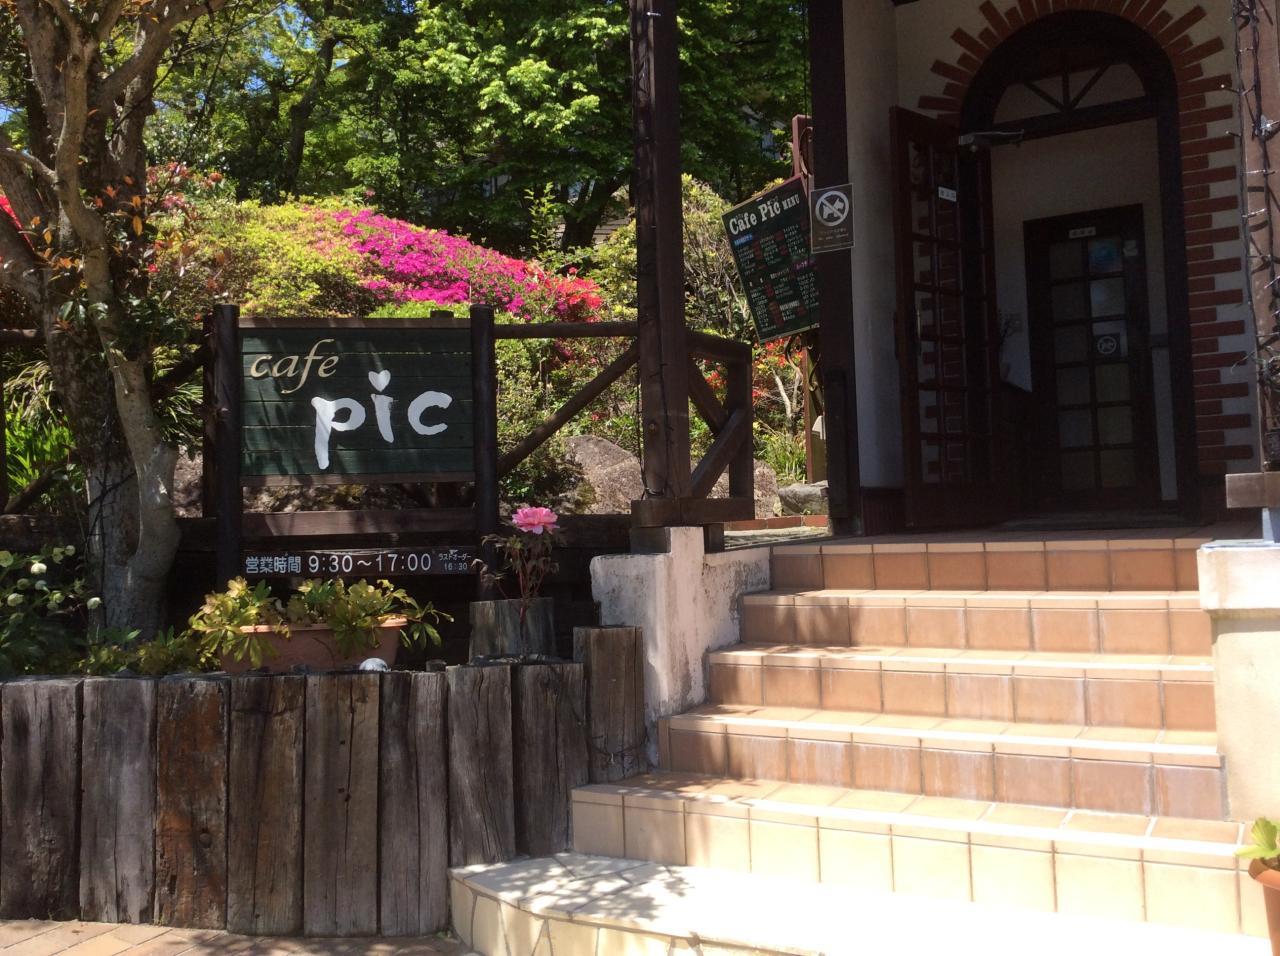 CafePic(店舗外観)